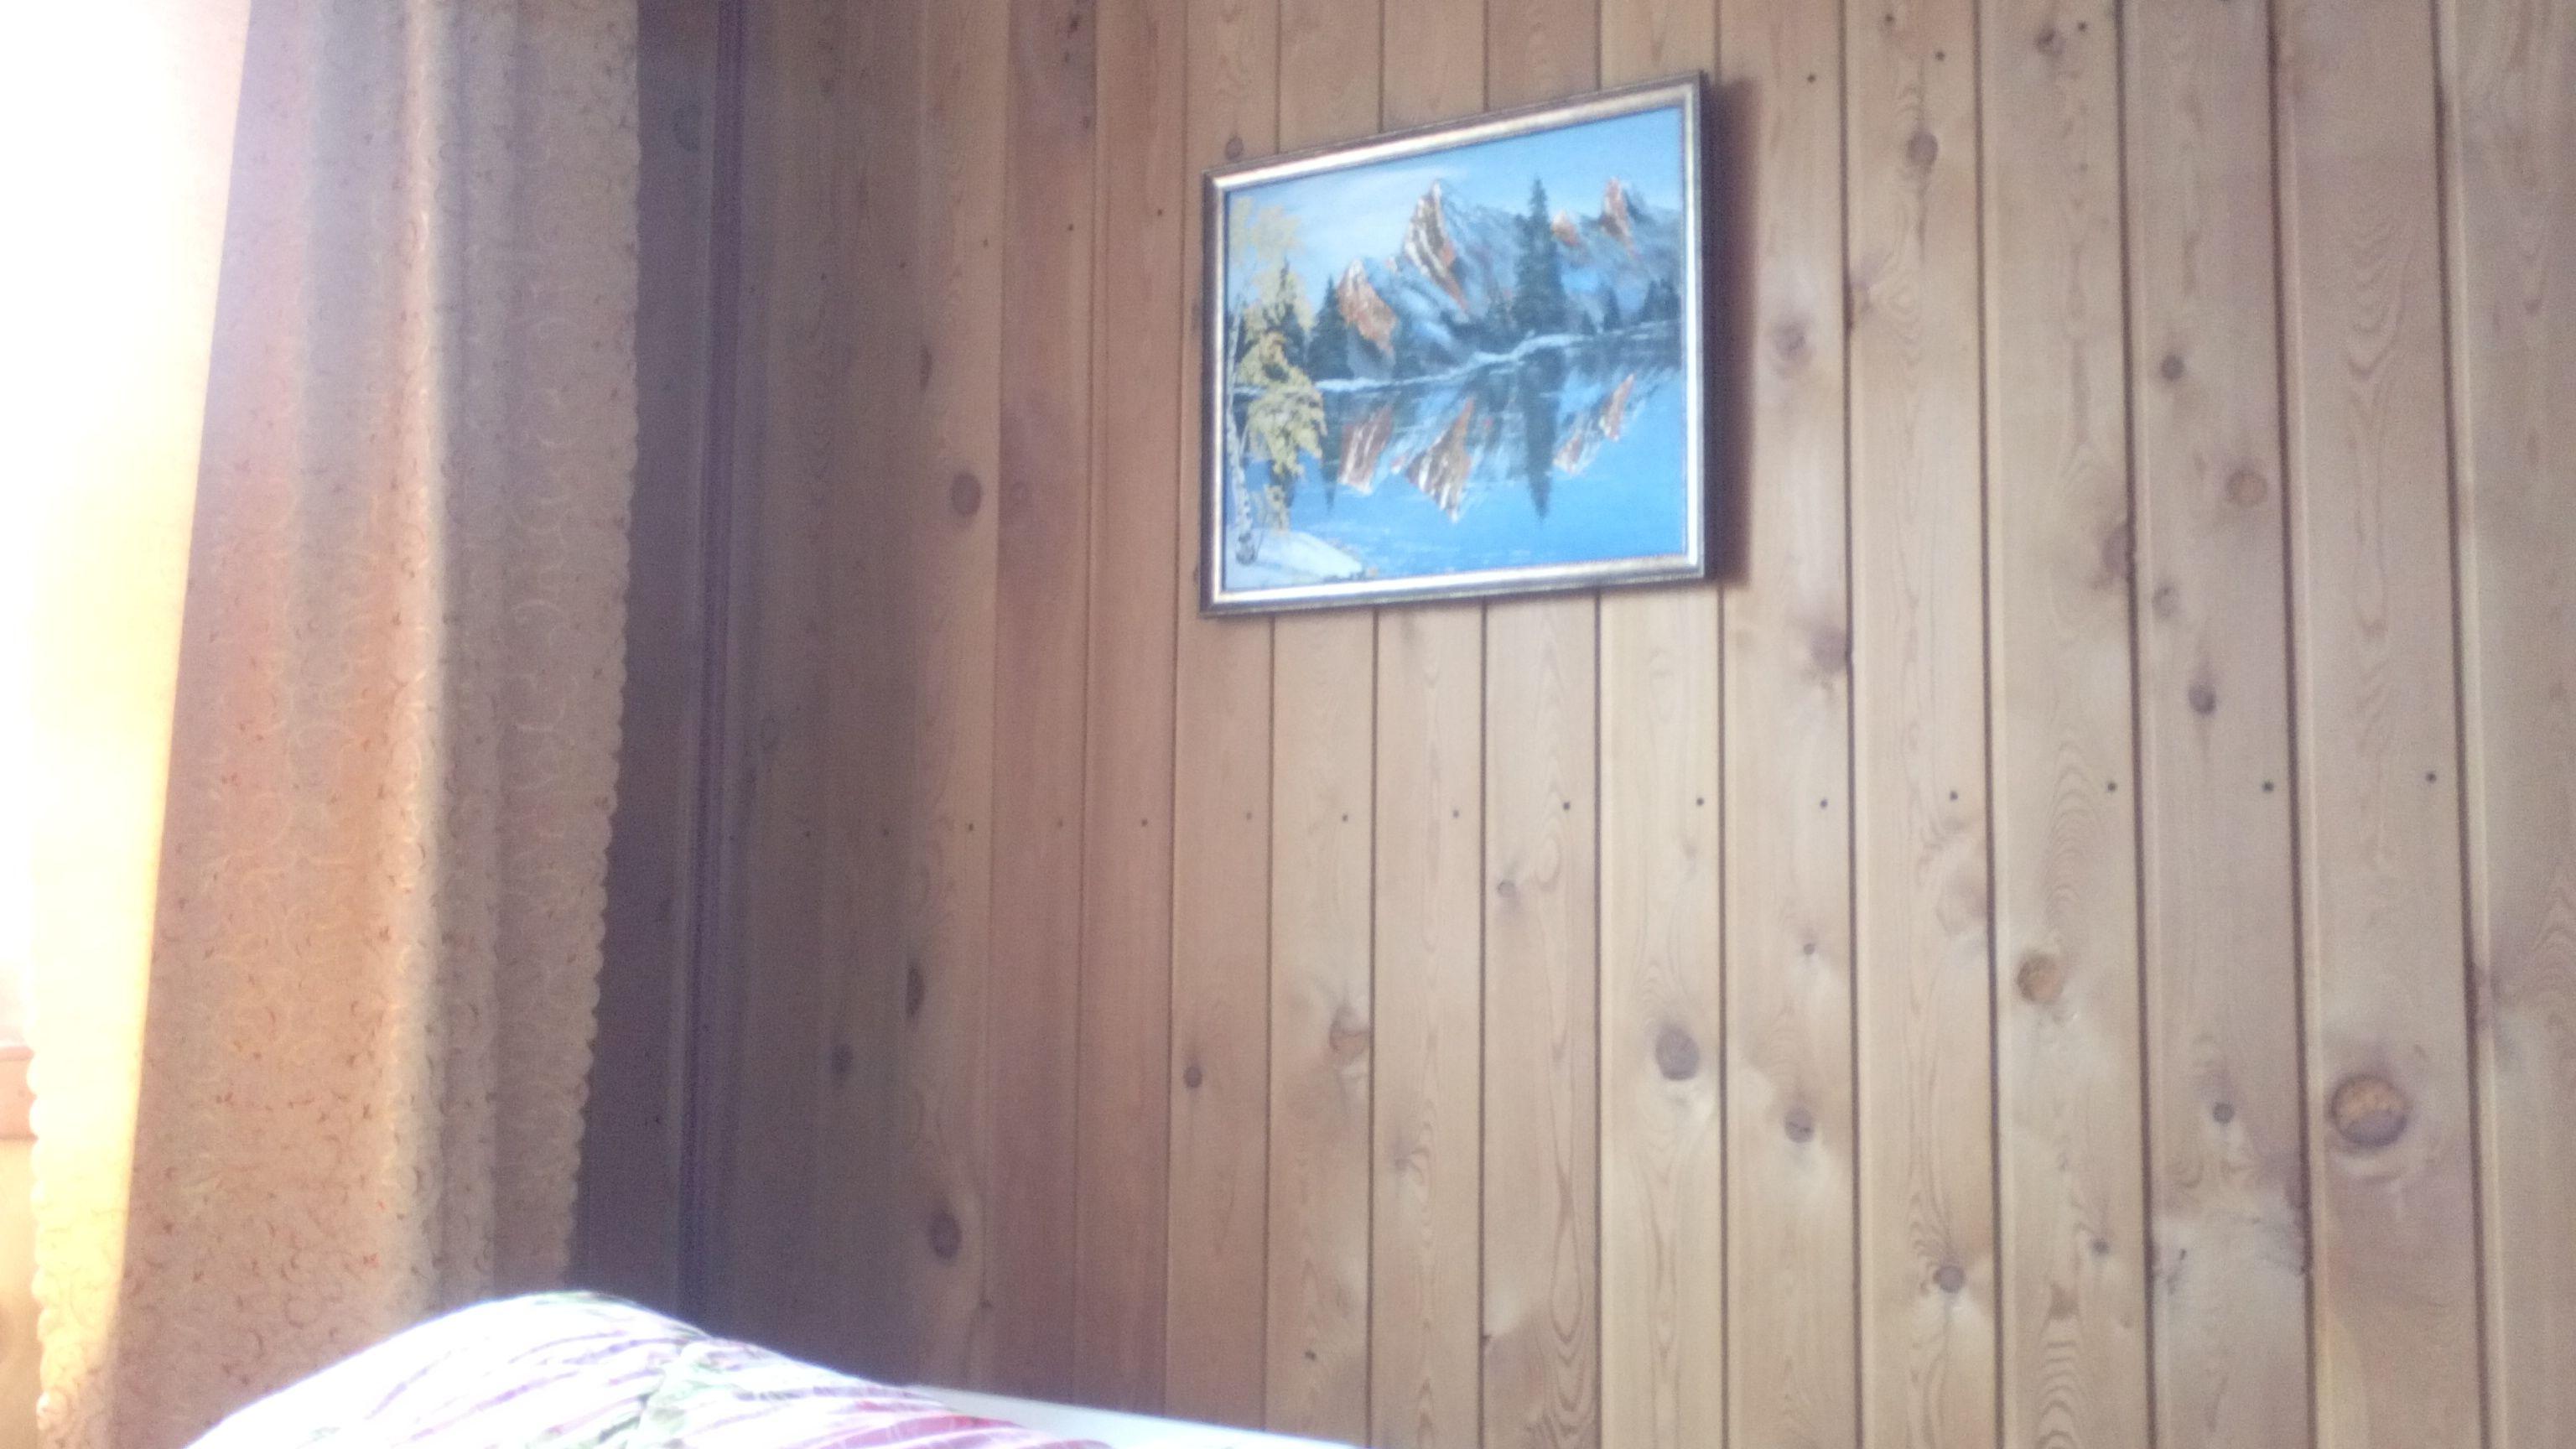 Картина в номере. Фото из архива блога shveda.ru